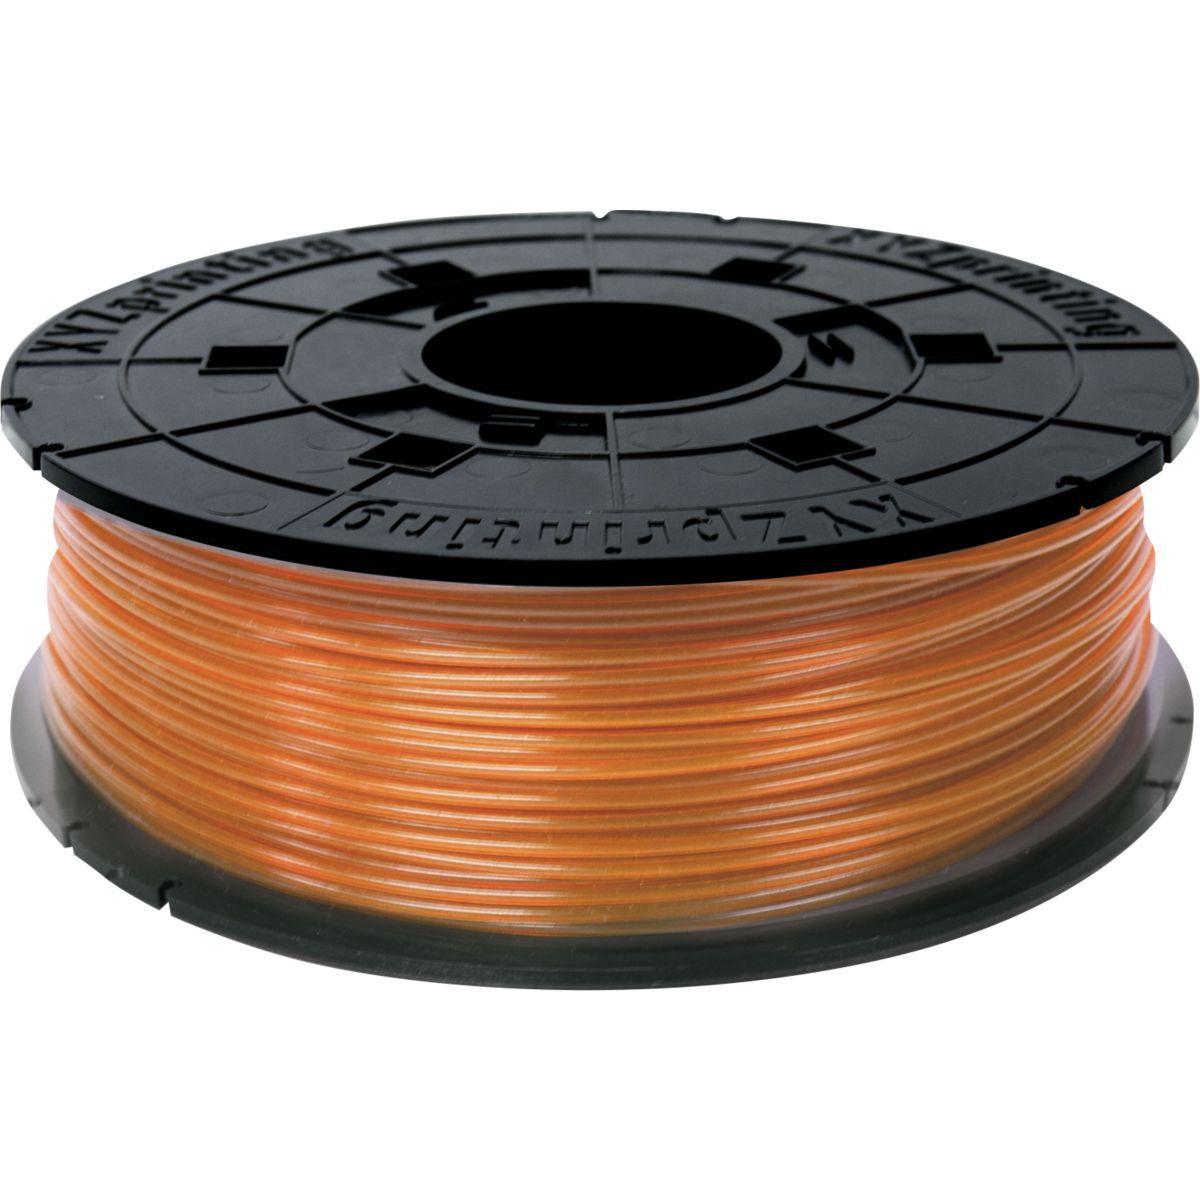 Filament 3d xyz printing pla junior mandarine - 2% de remise i...